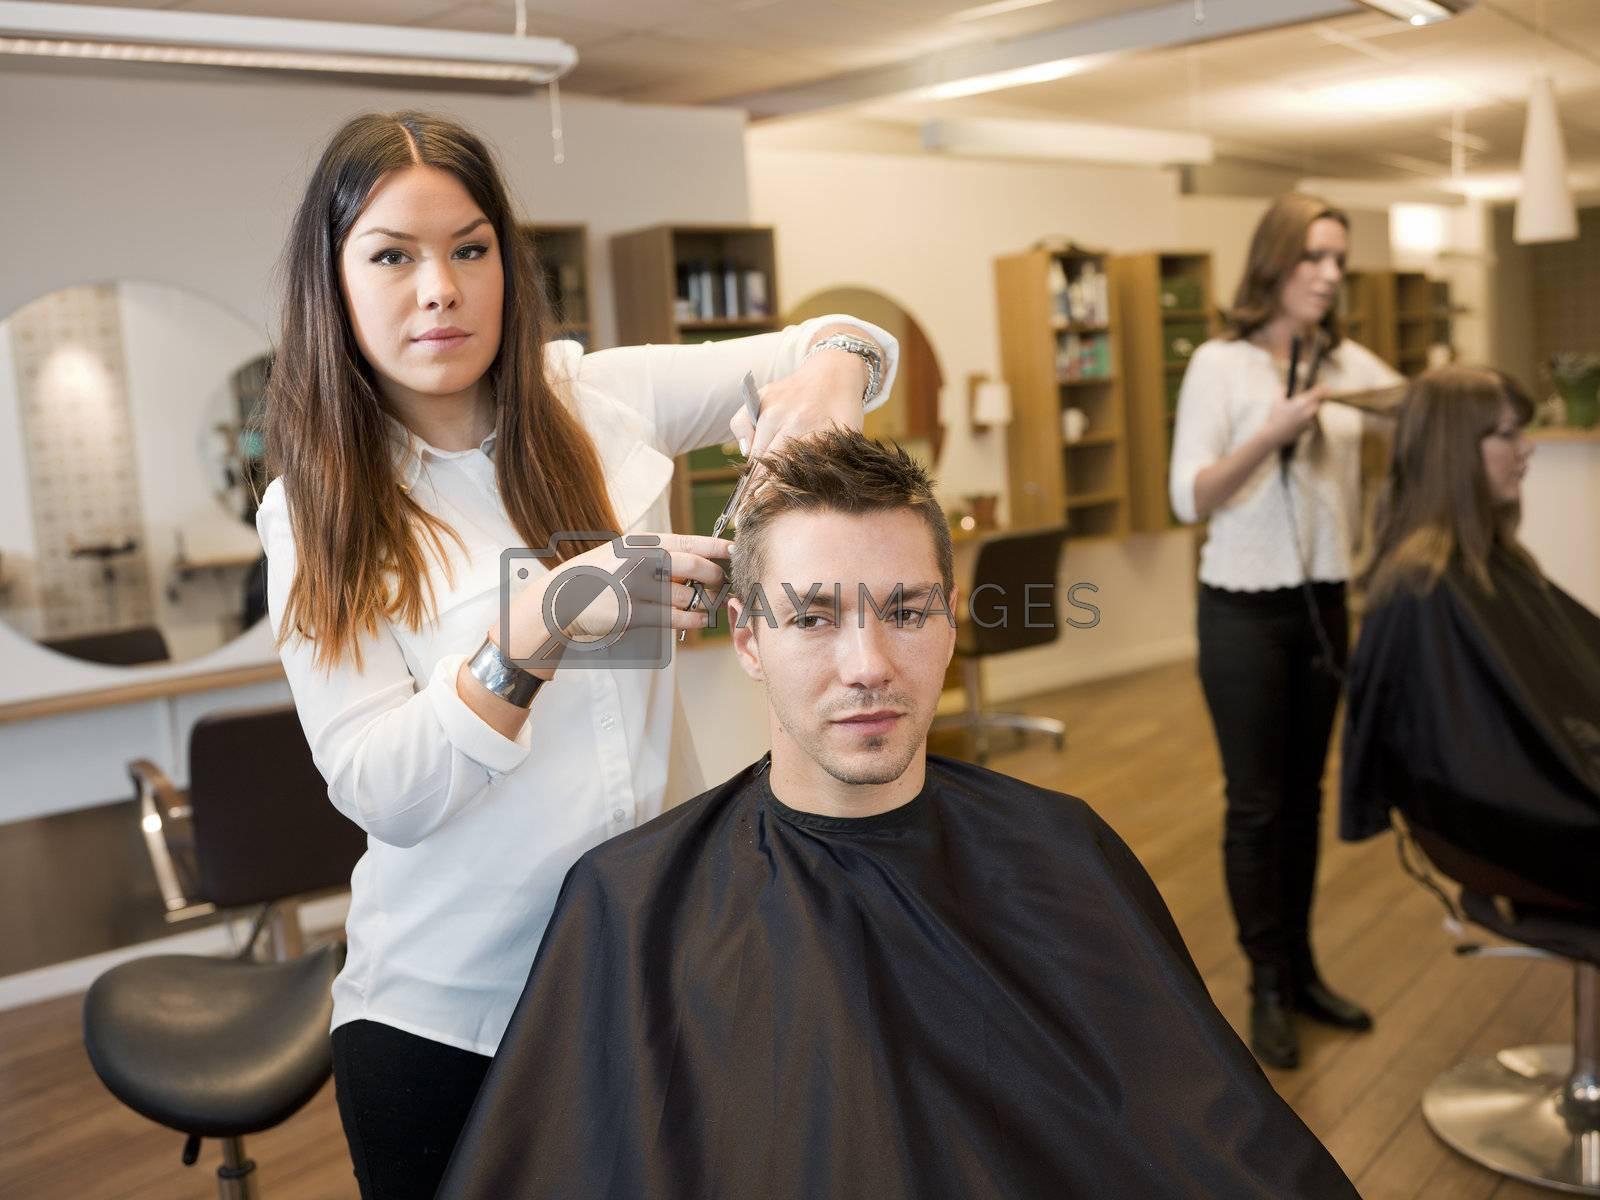 Beauty salon situation by gemenacom